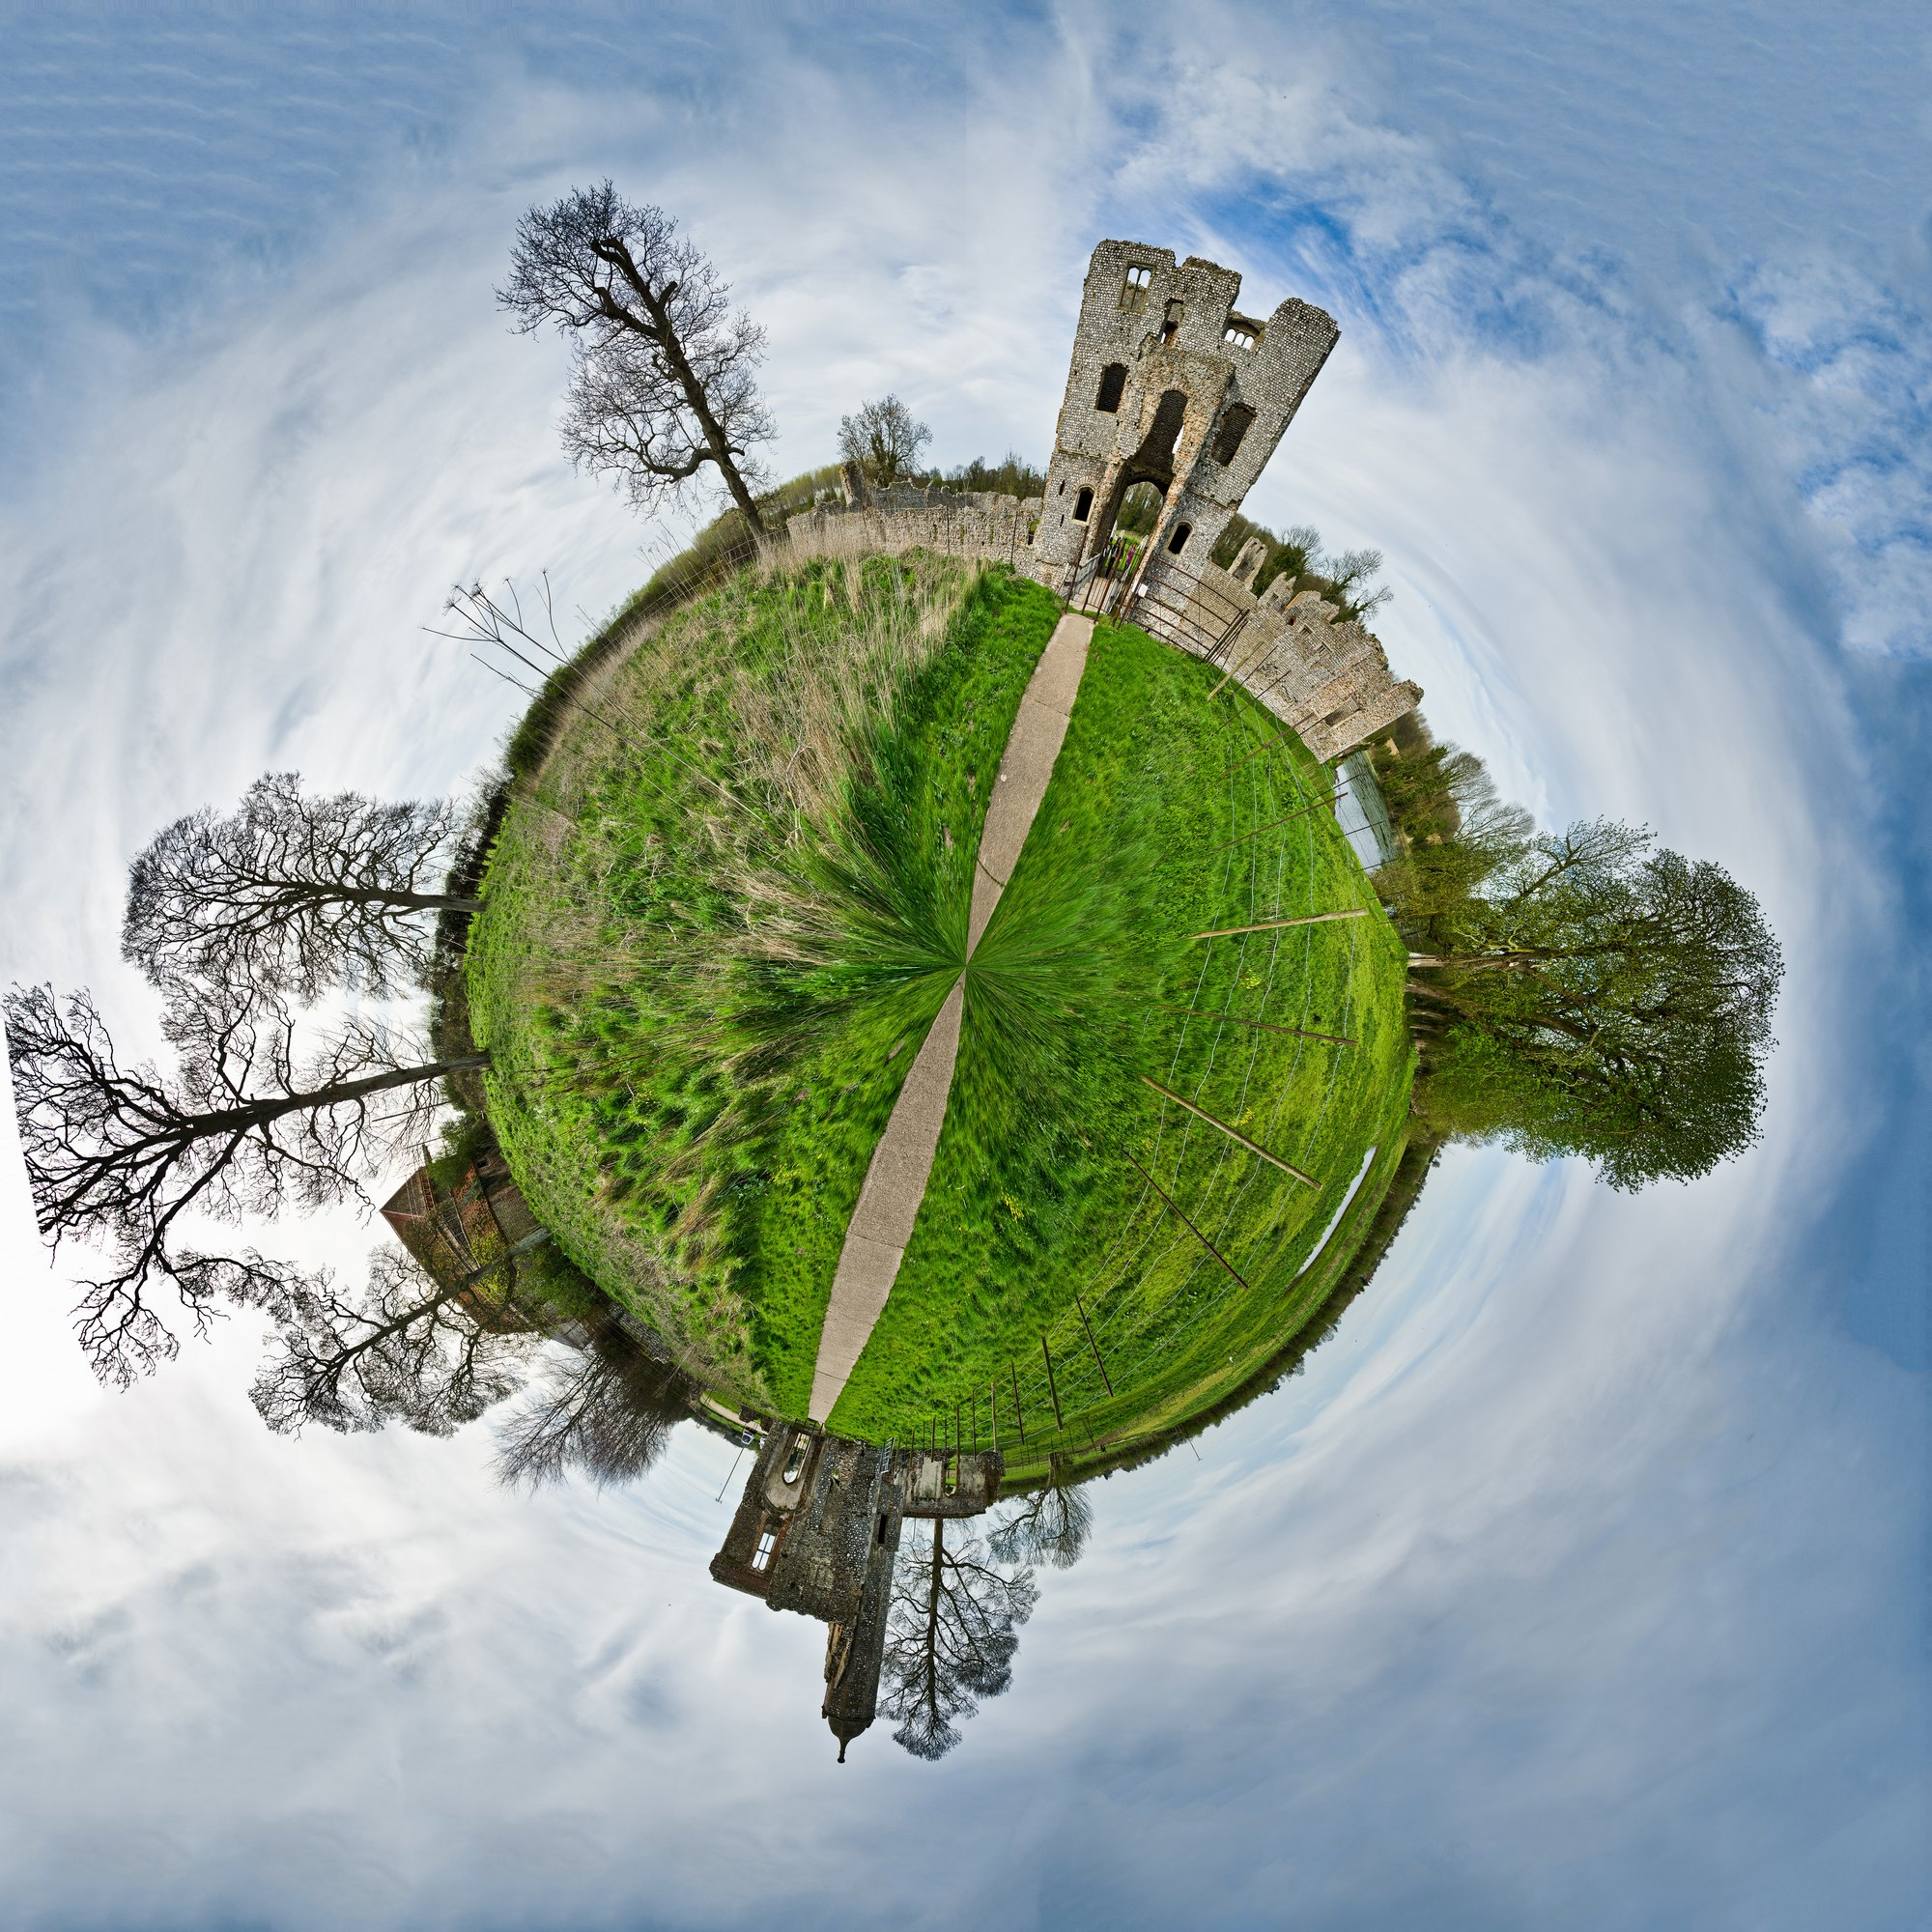 Baconsthorpe Castle 9 Mile Walk